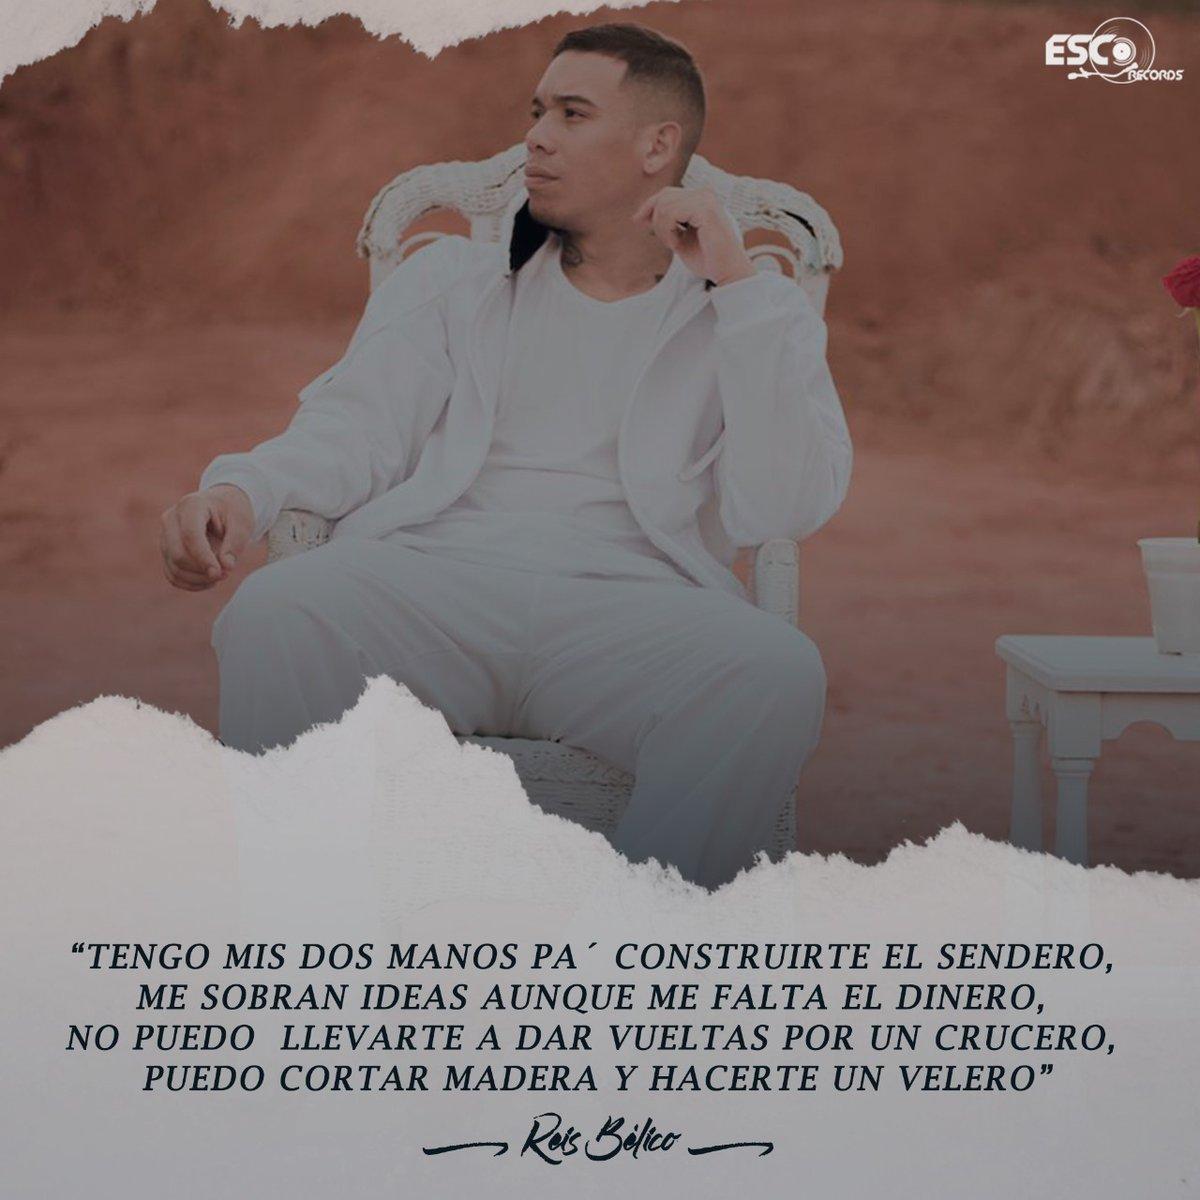 #NoMás #ReisBelico #EscoRecords   Disfruta de la mejor música en #OneRPM   http://bit.ly/37LaZEnpic.twitter.com/CfC5hdl5HR